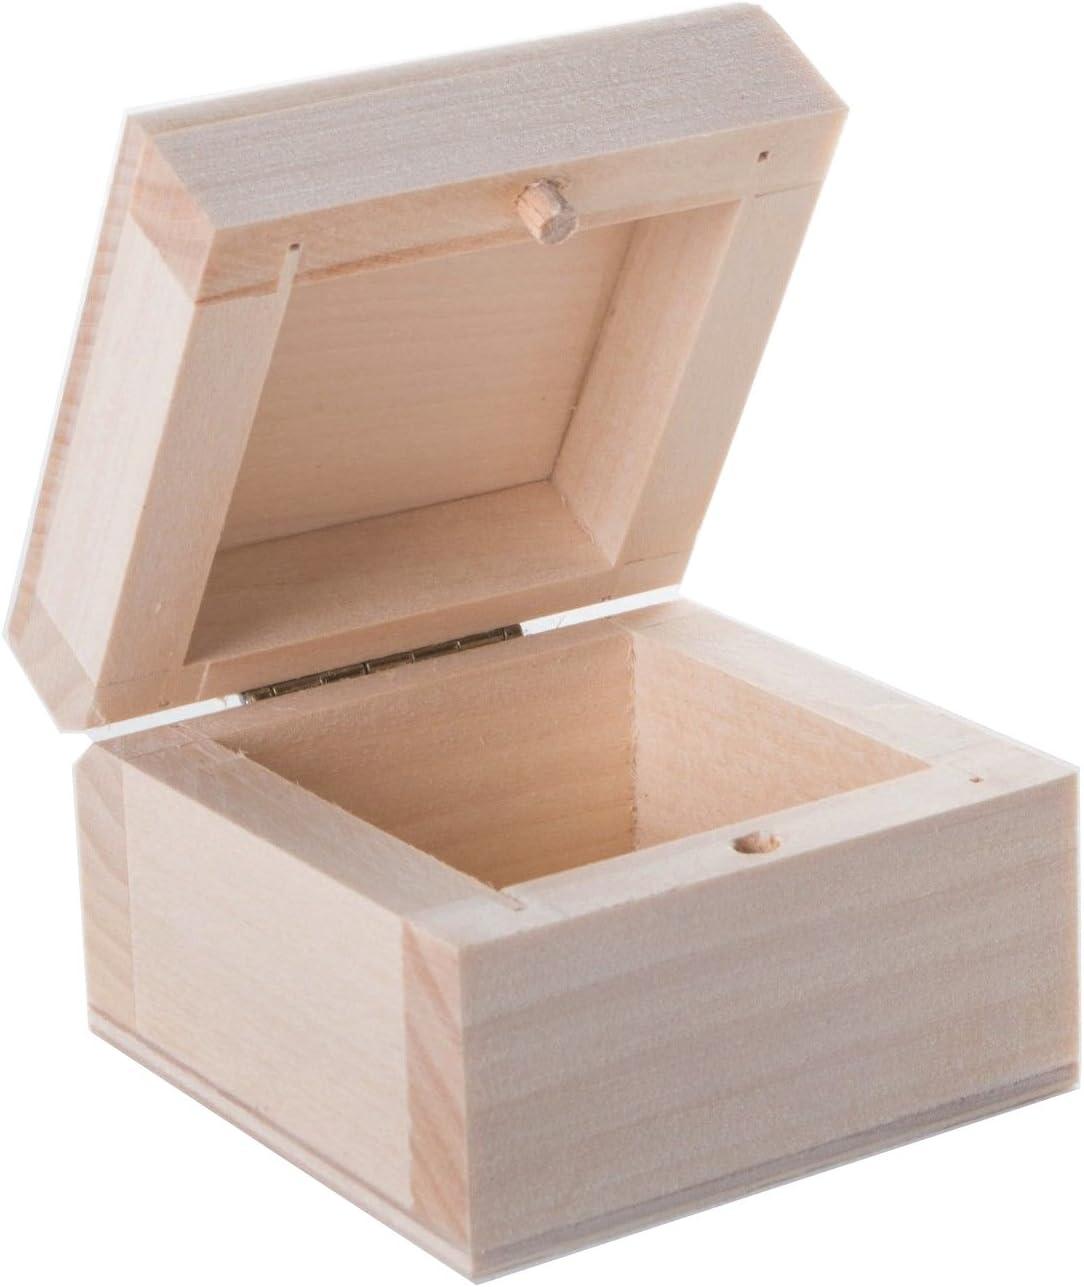 Pequeña Caja de Almacenamiento de Madera con Tapa, sin Pintar, Caja de Anillos, 6,5 x 6,5 x 4,5 cm: Amazon.es: Hogar